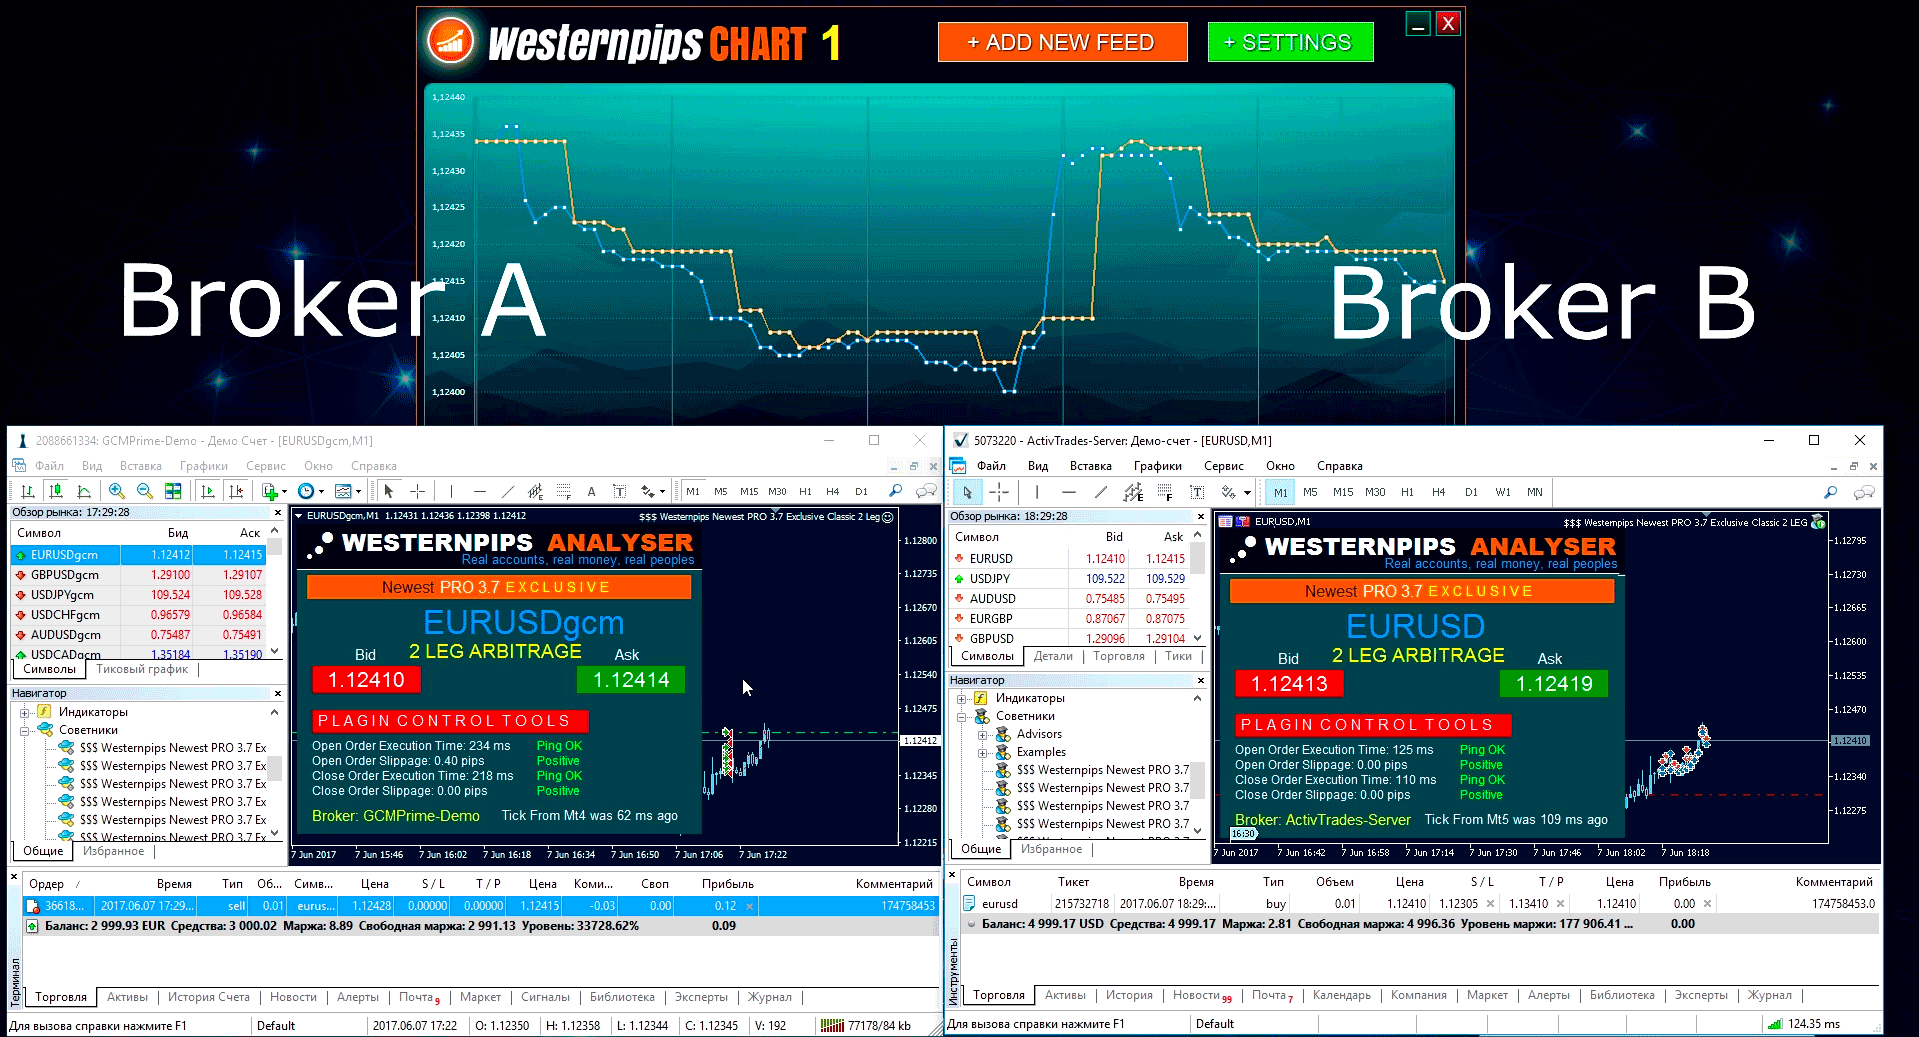 2 Leg Arbitrage Trading Software - Westernpips Analyser 1.3